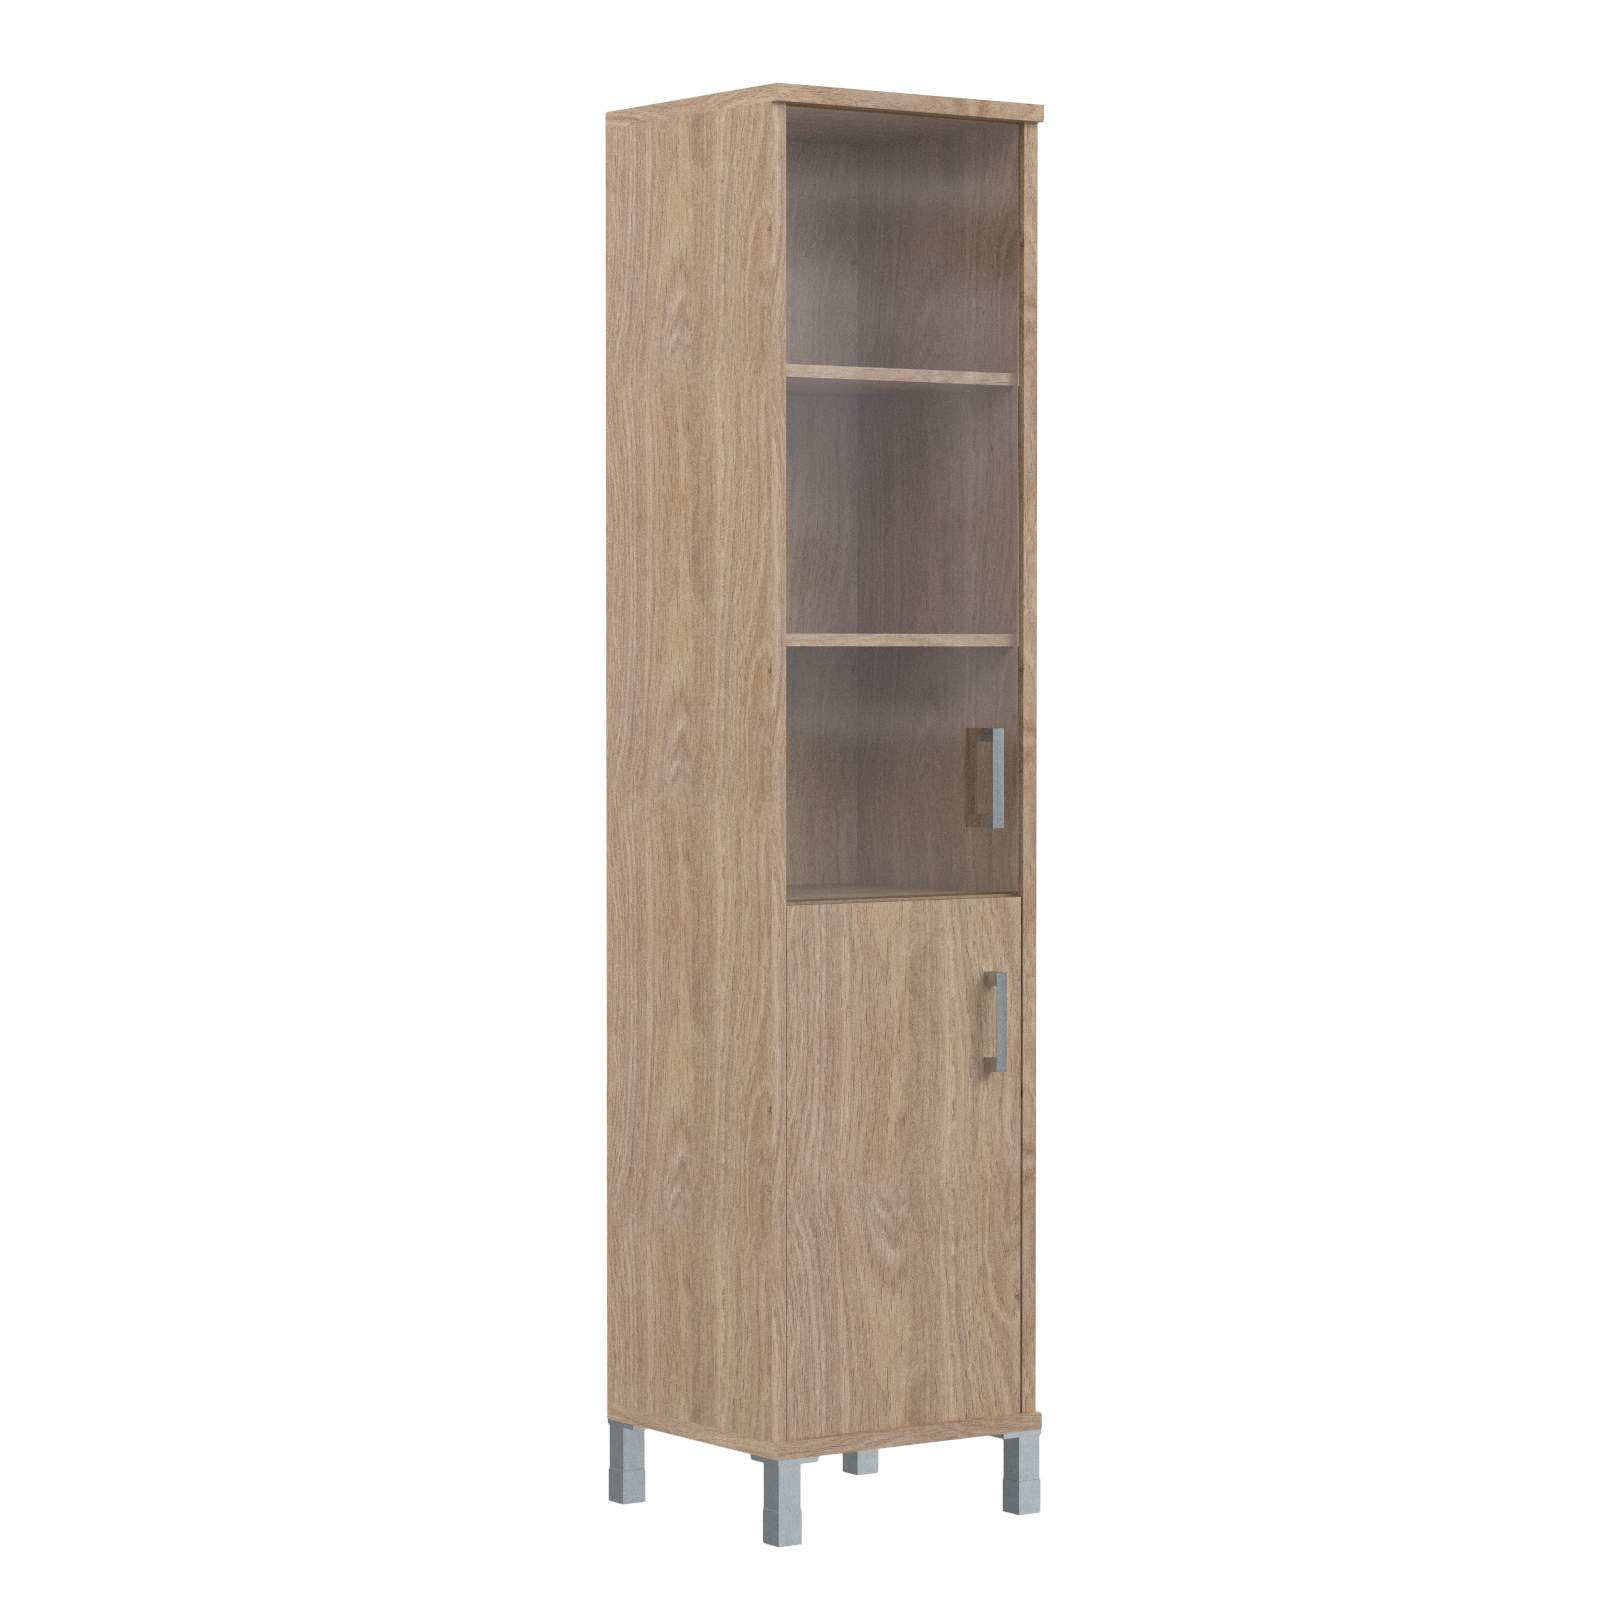 Шкаф колонка комбинированная со стеклом левая 475х435х2004